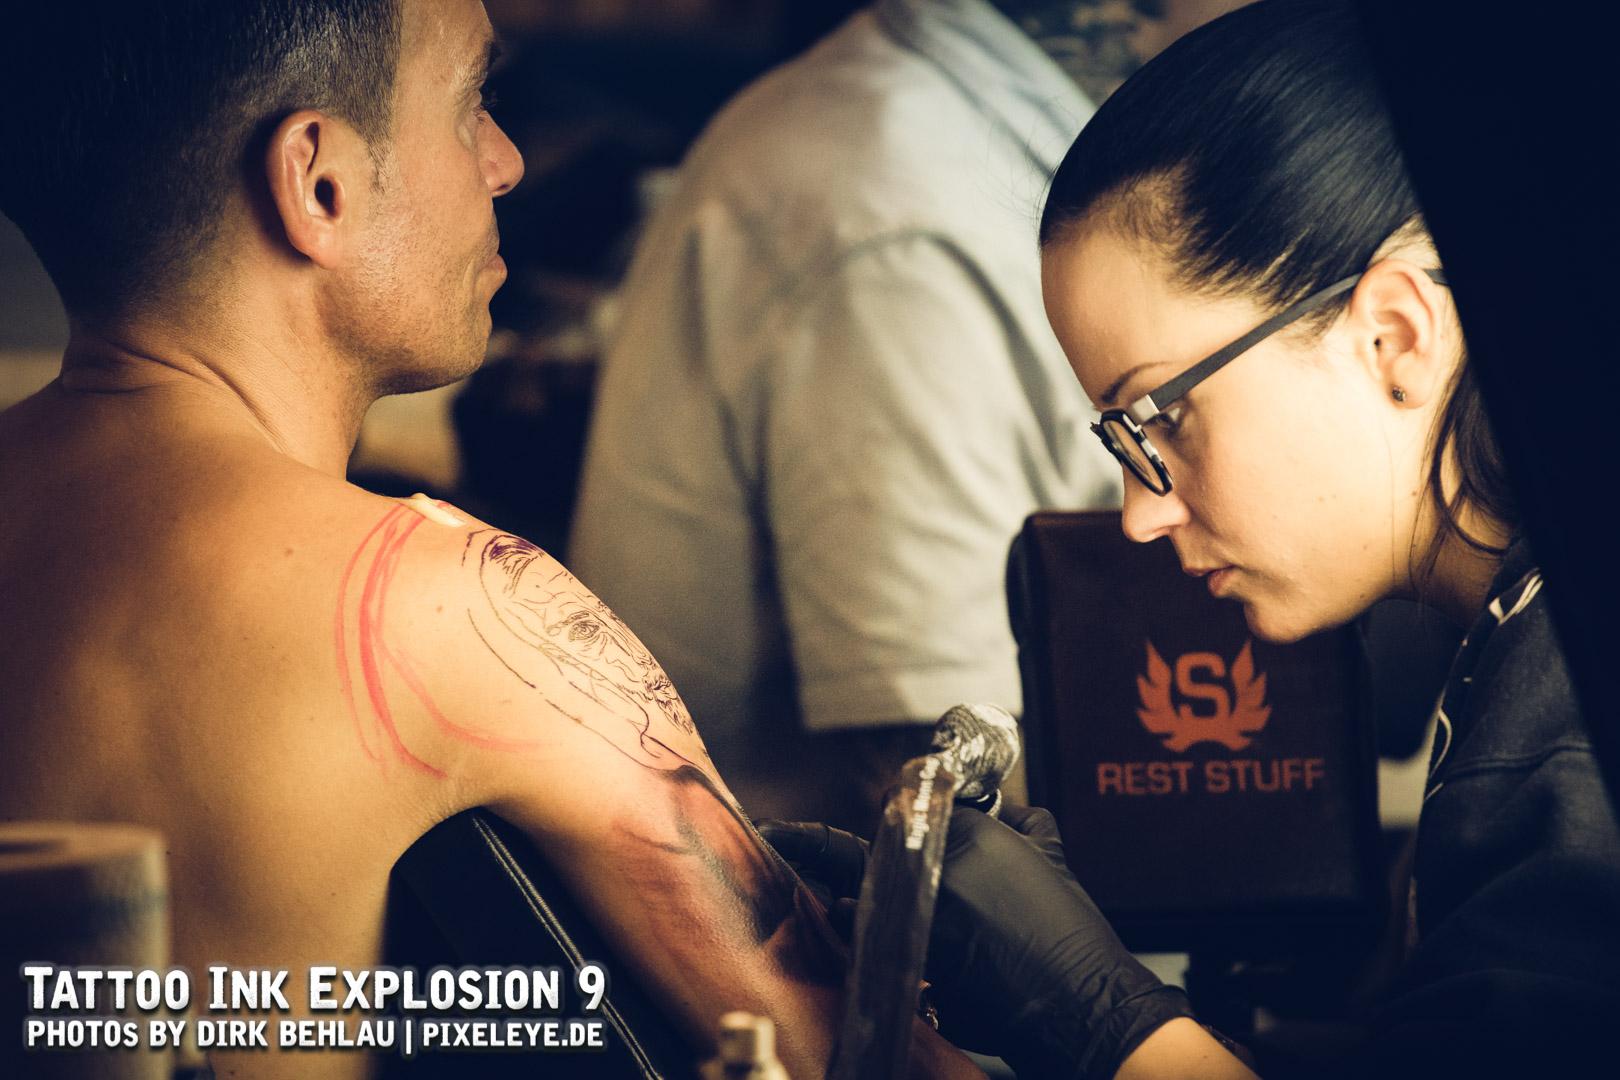 Tattoo Ink Explosion 2018 WEB by Dirk Behlau-1233.jpg